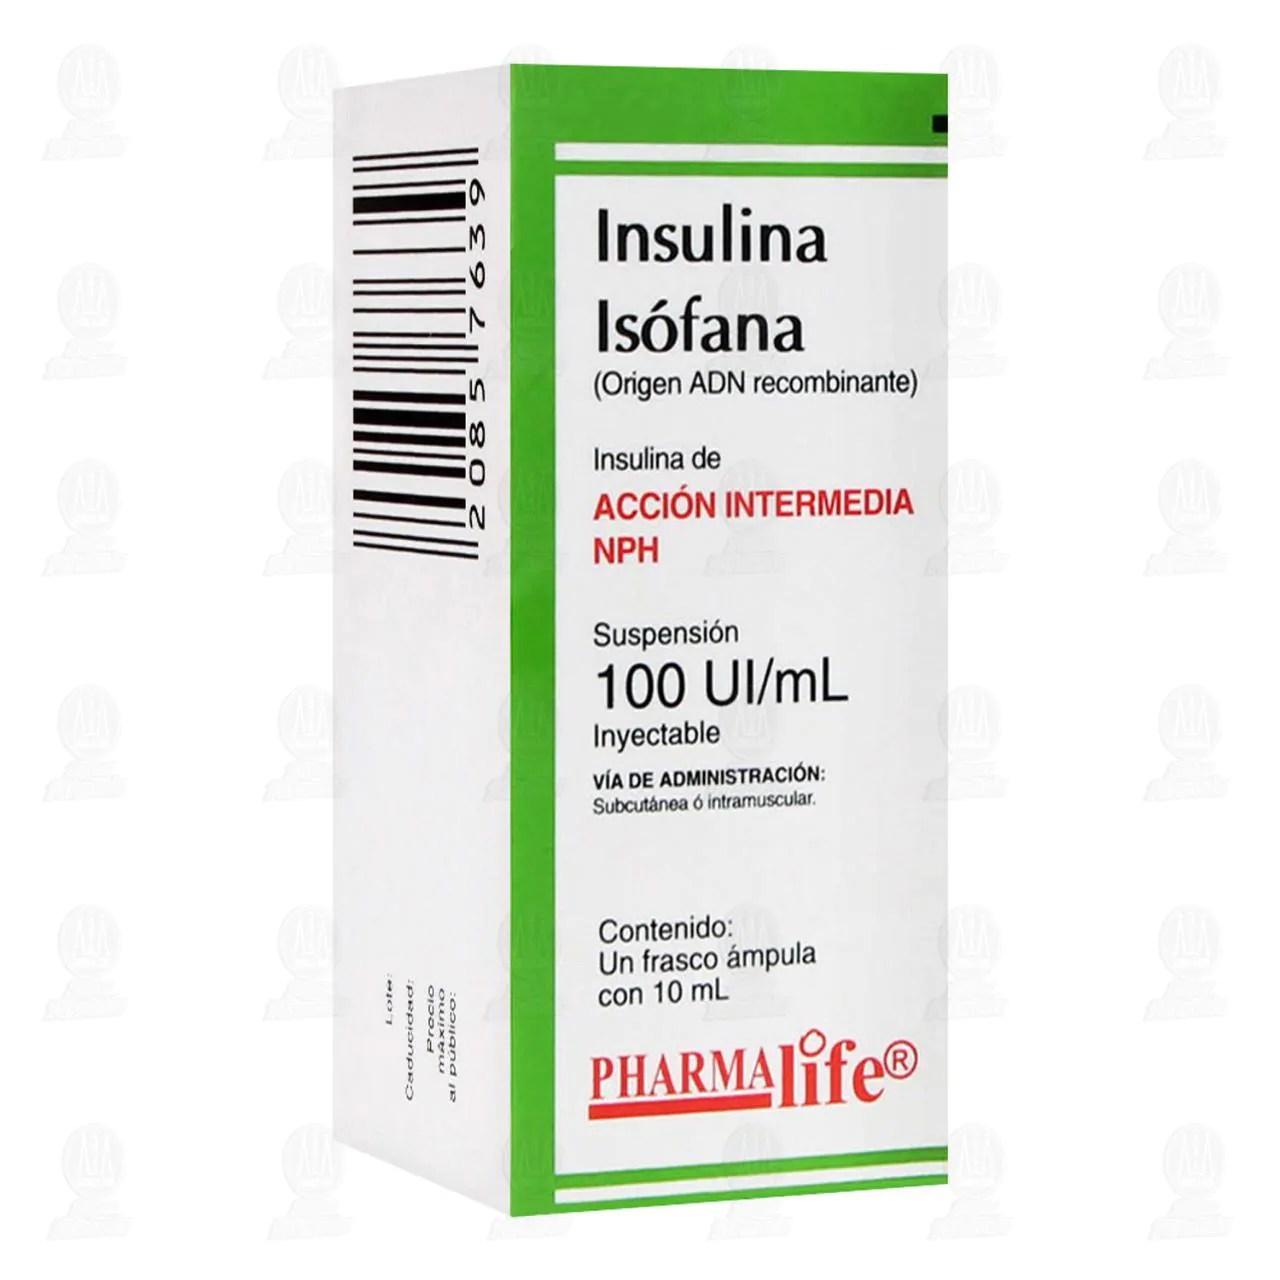 Comprar Insulina Isófana NPH 100ui/ml 1 Frasco Ámpula 10ml ...